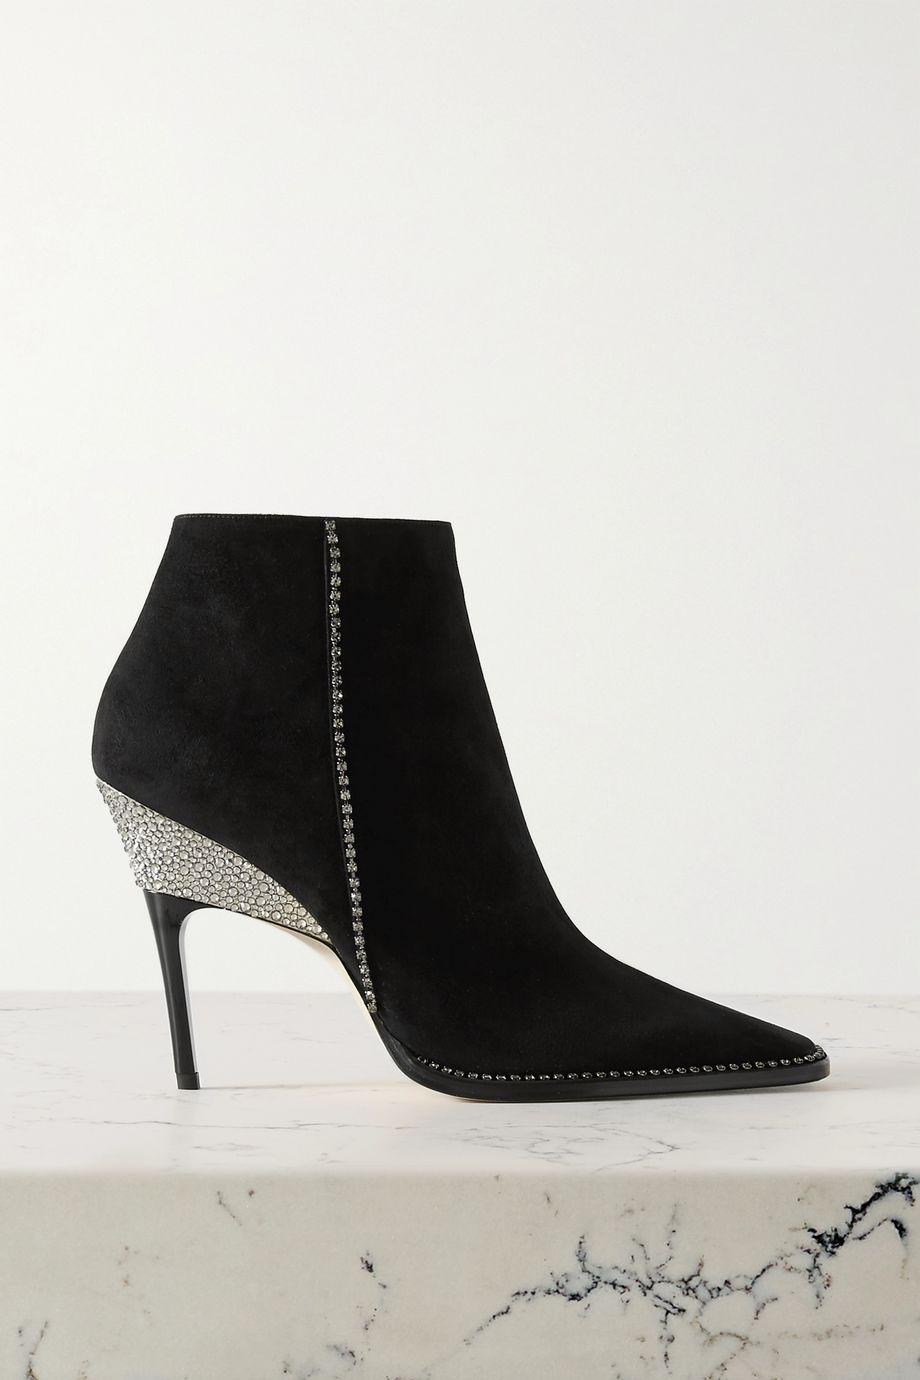 Jimmy Choo Brecken 100 crystal-embellished suede ankle boots